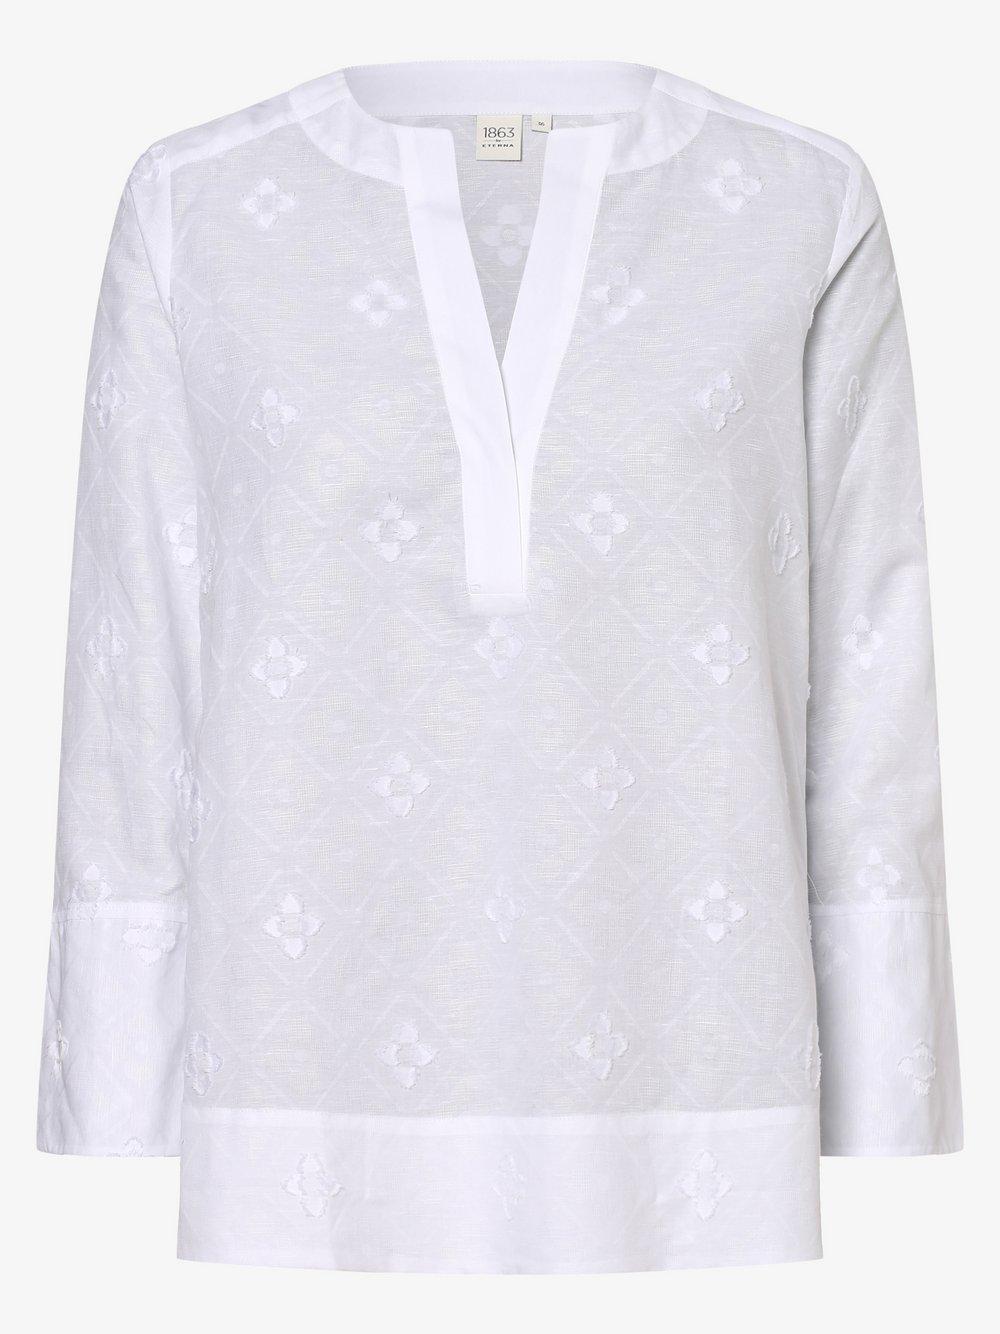 Eterna Premium – Bluzka damska z dodatkiem lnu, biały Van Graaf 461836-0001-00360